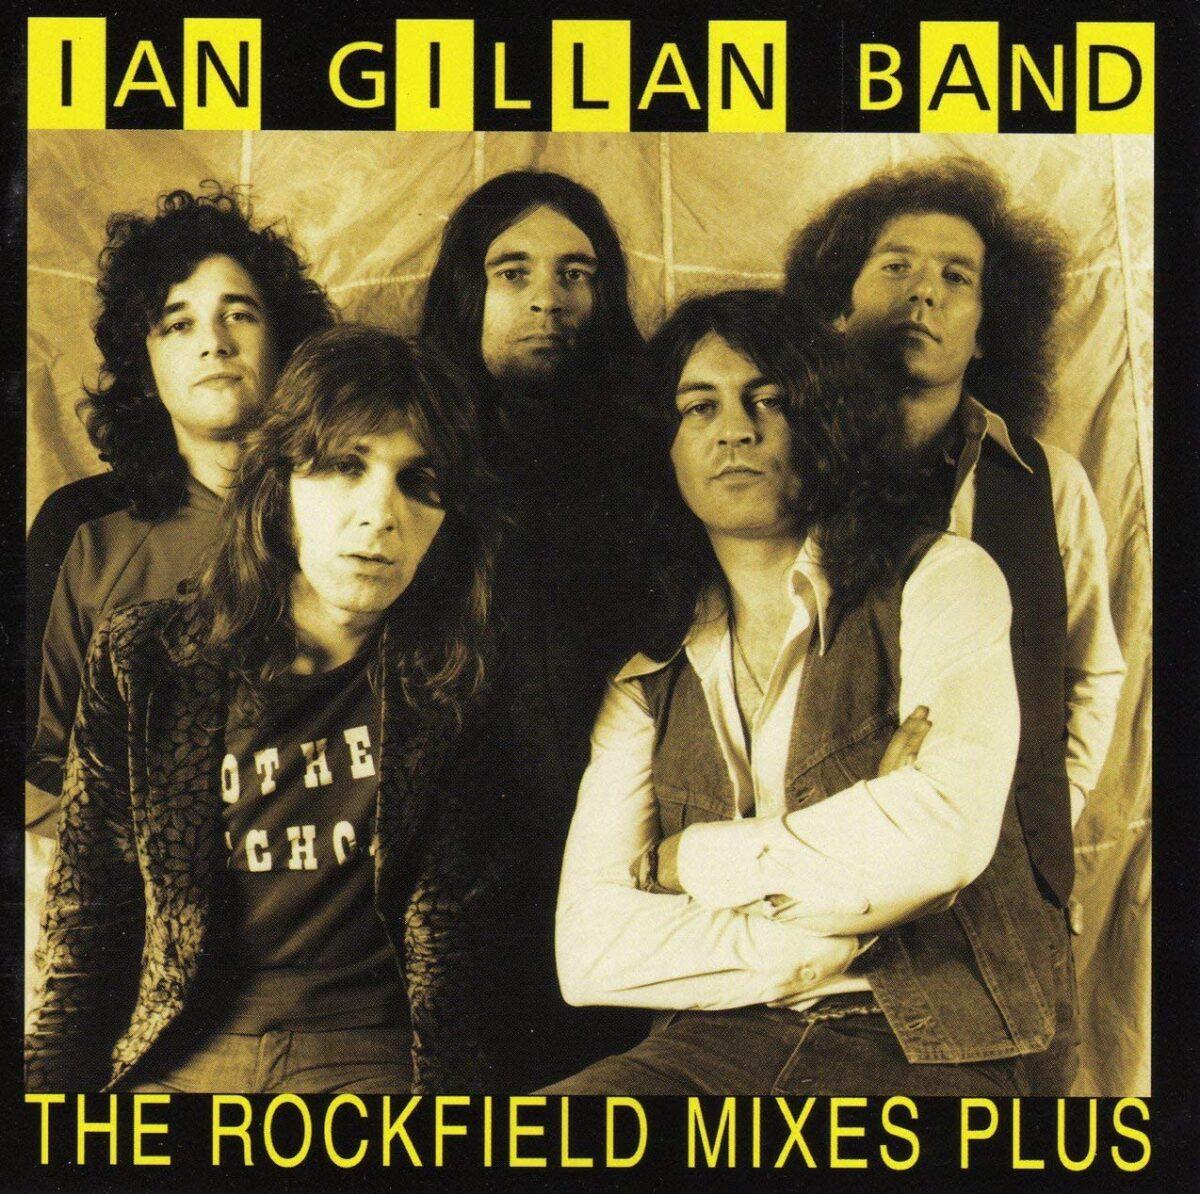 Ian Gillan Band - The Rockfield Mixes...Plus